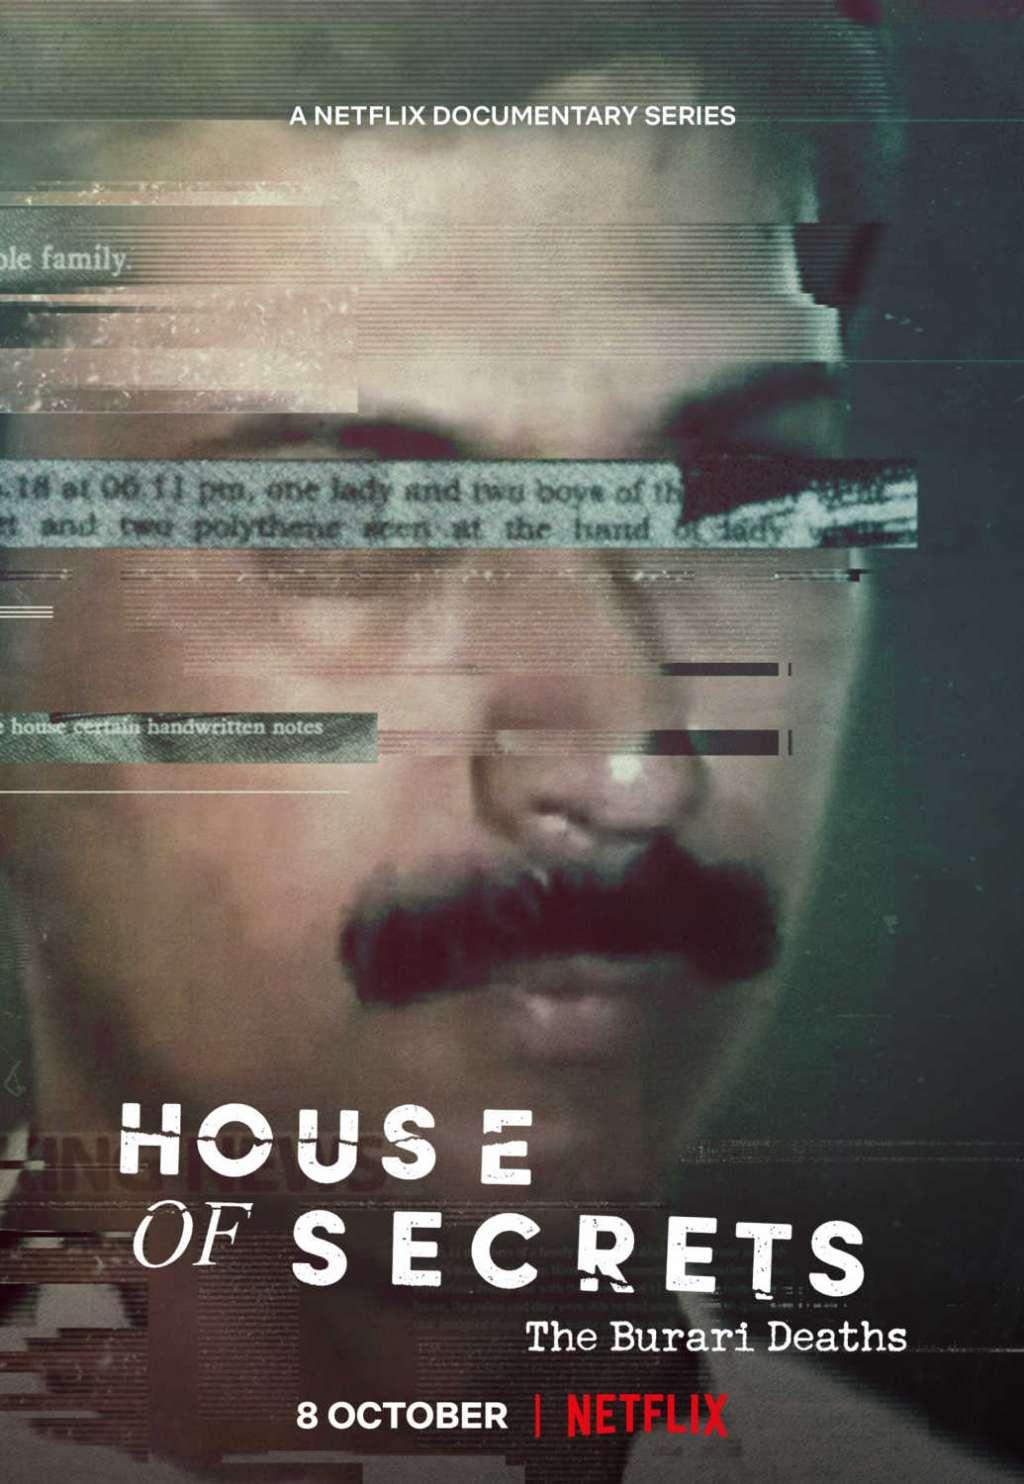 House of Secrets: The Burari Deaths kapak